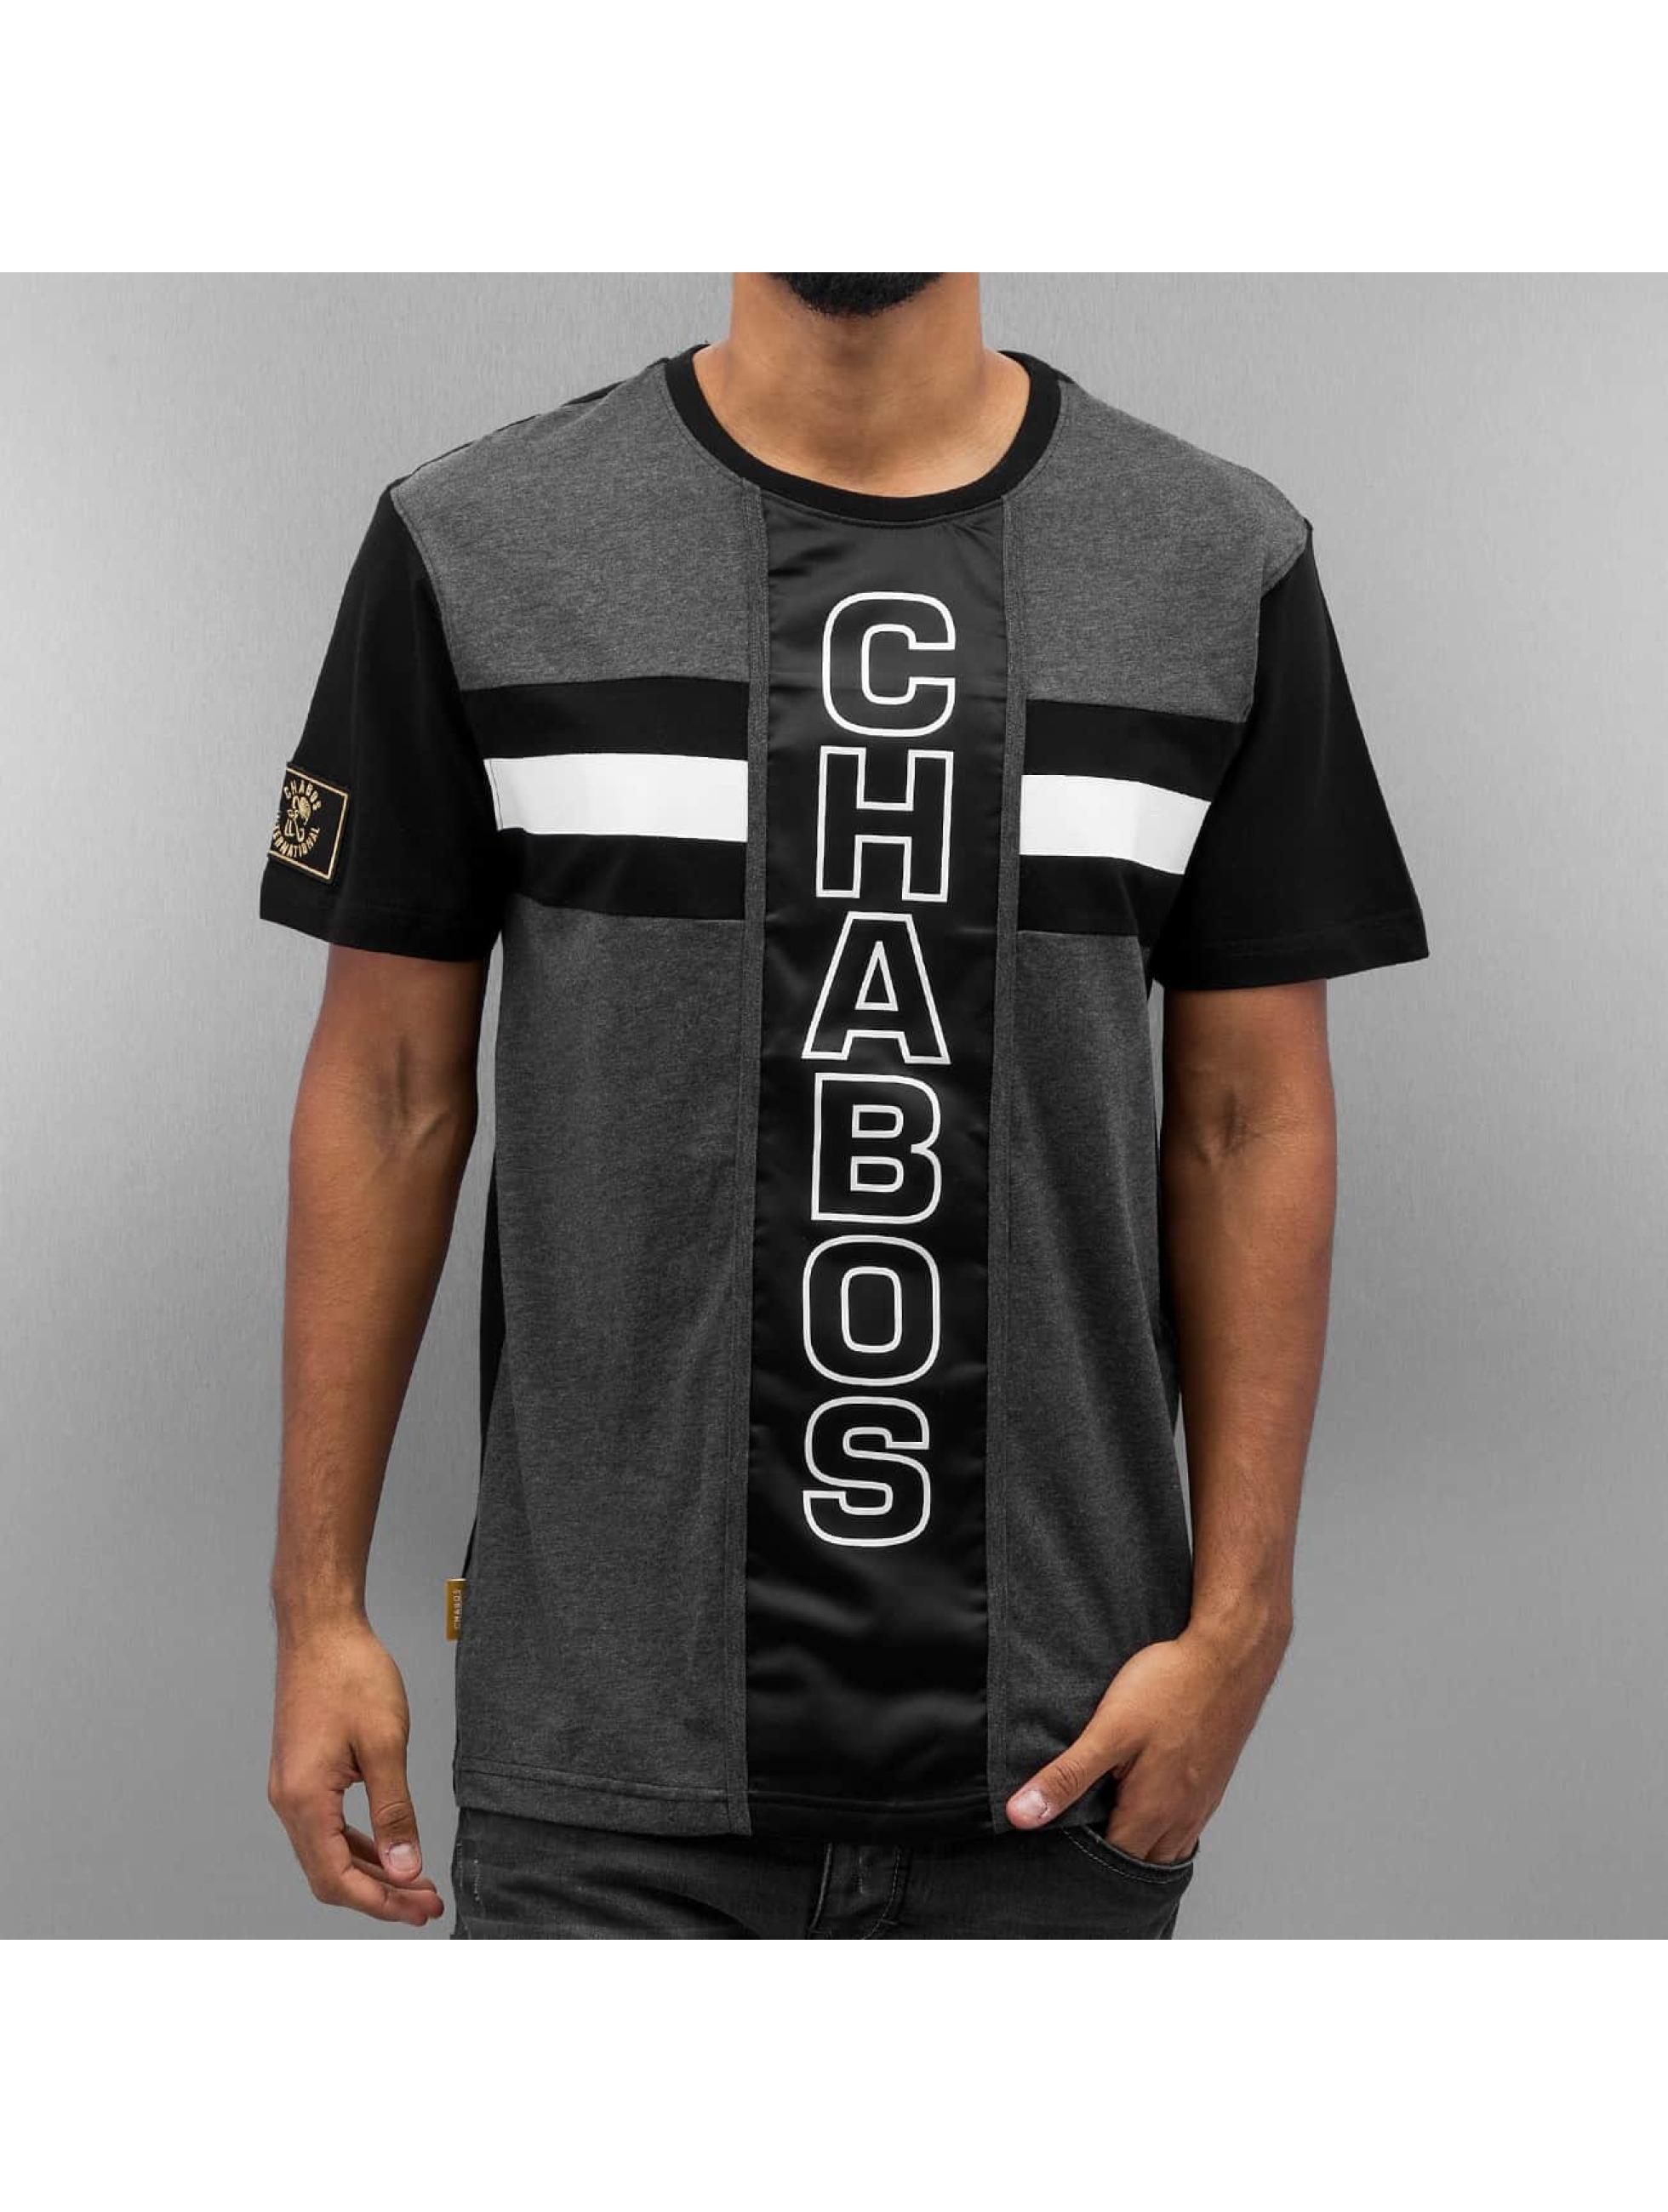 CHABOS IIVII T-Shirt Vertical gris